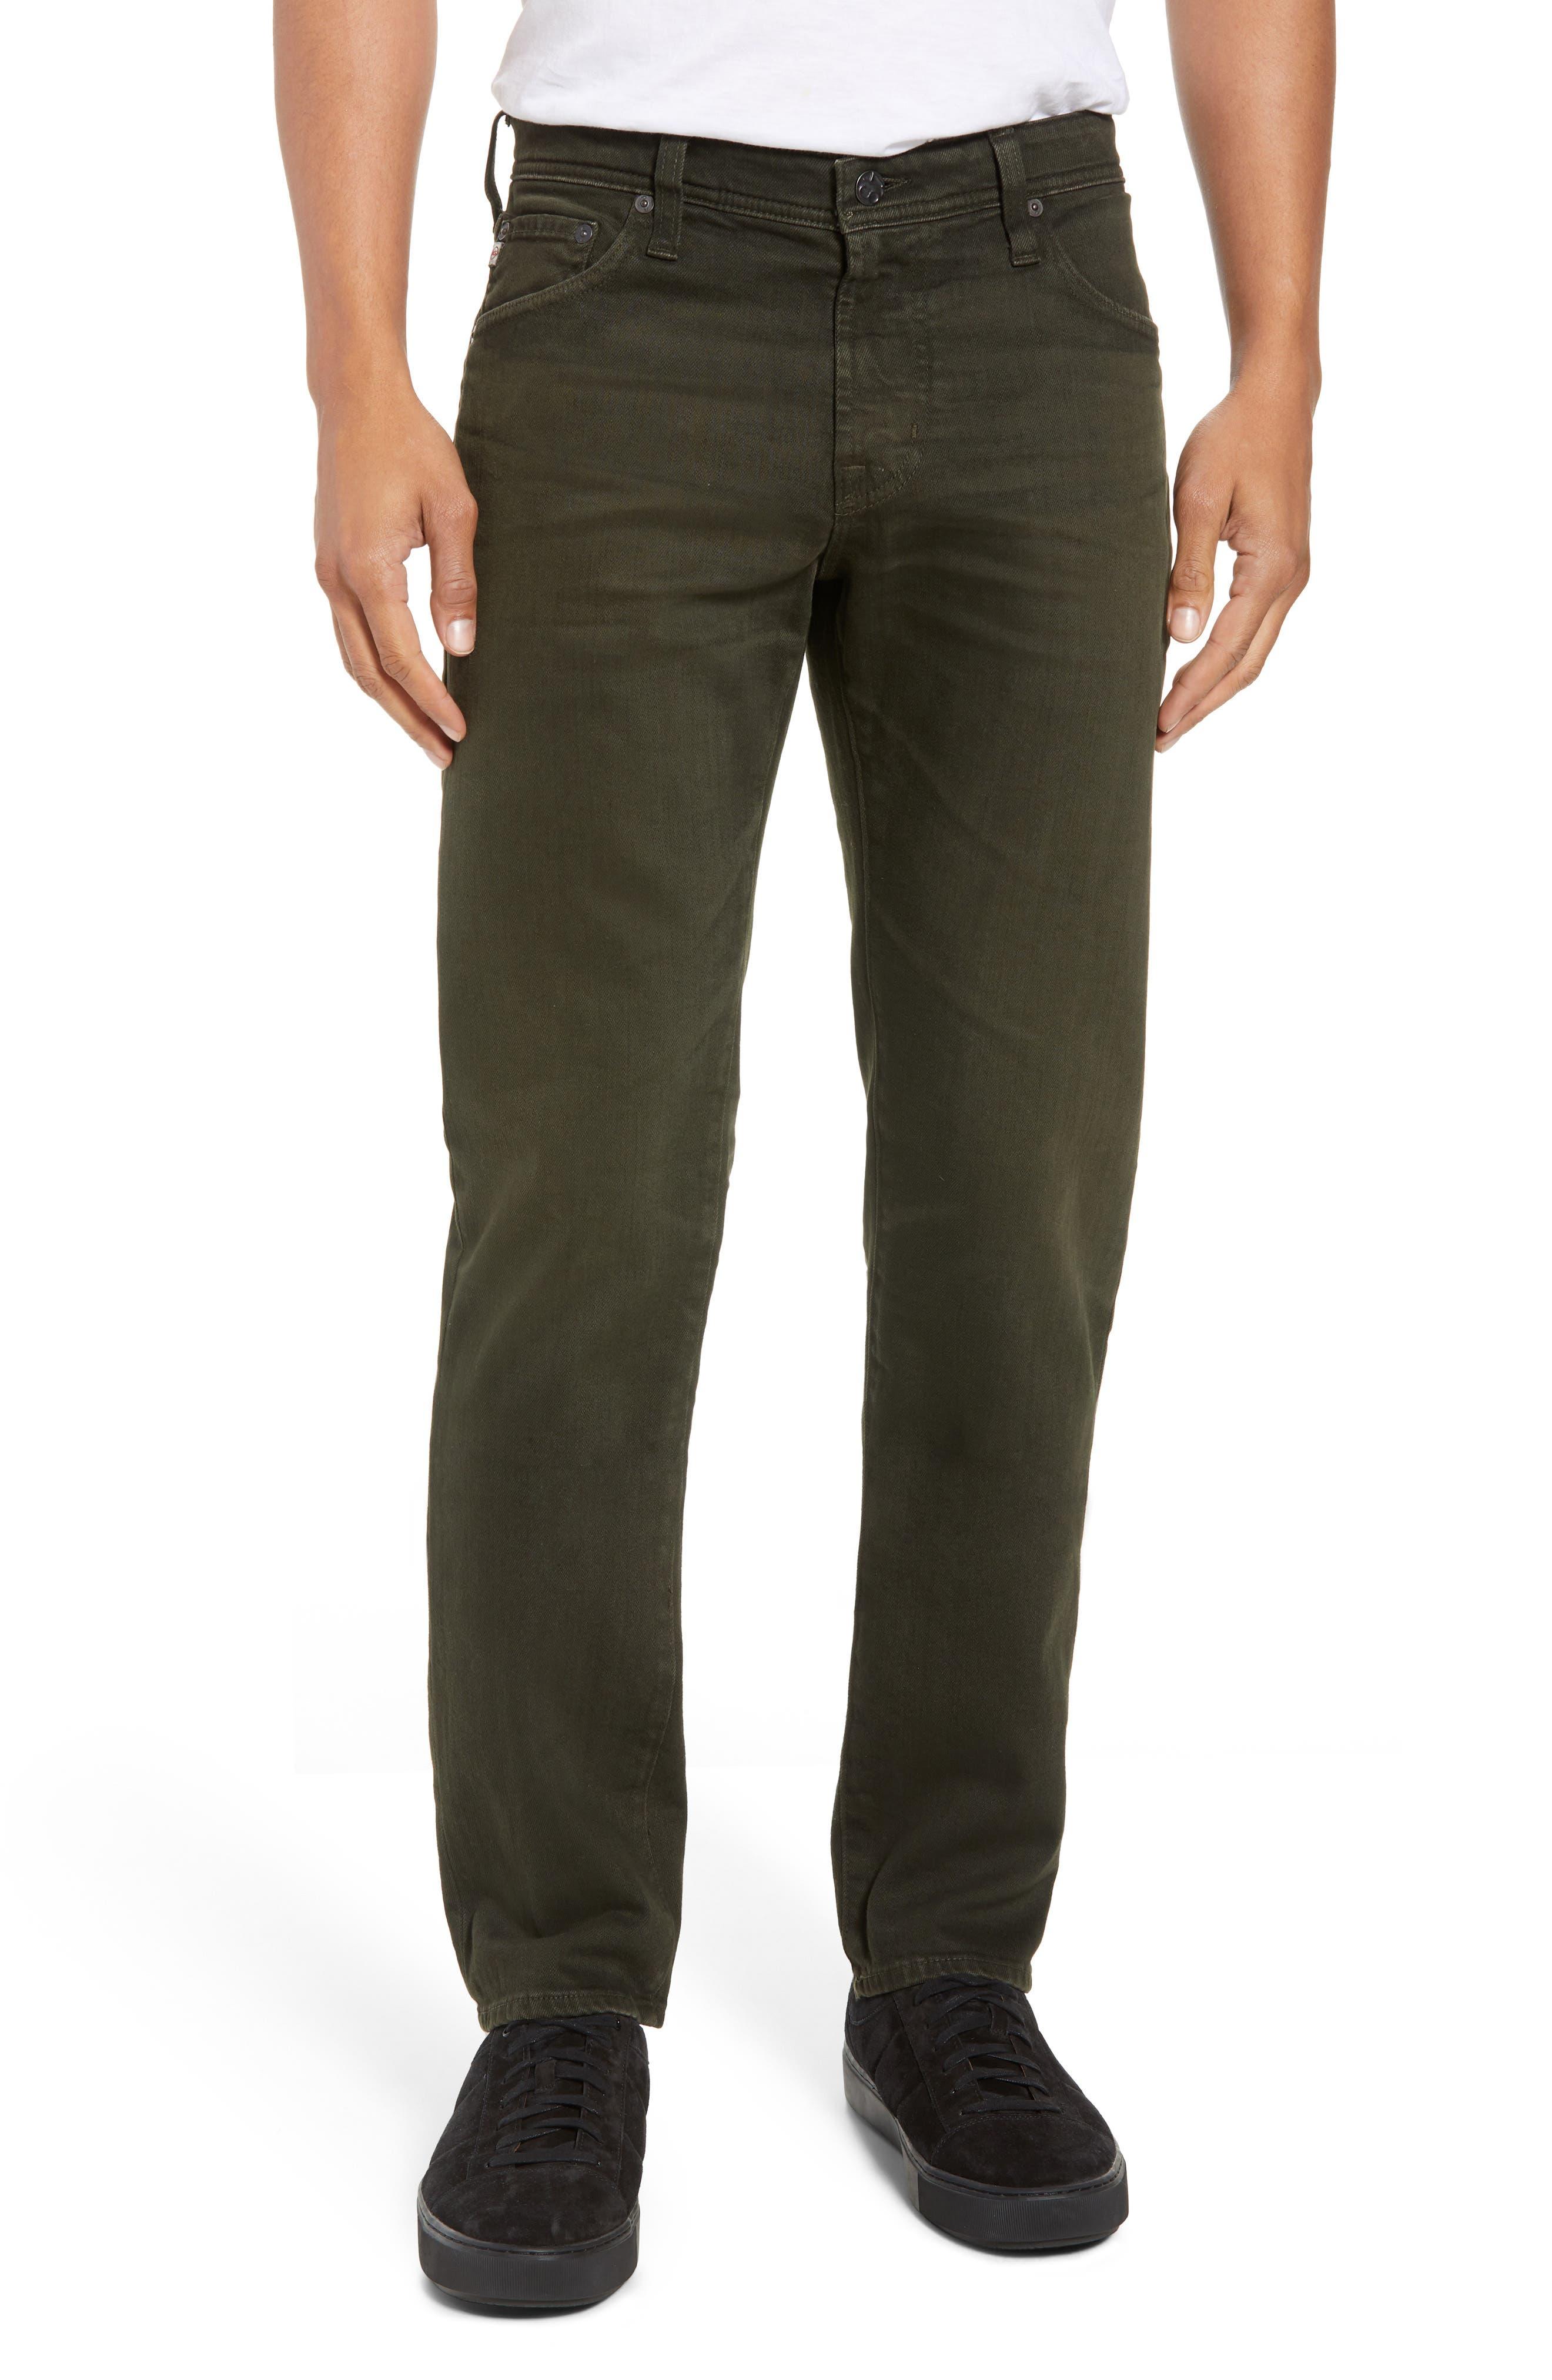 Tellis Slim Fit Jeans,                             Main thumbnail 1, color,                             7 YEARS OAK GROVE